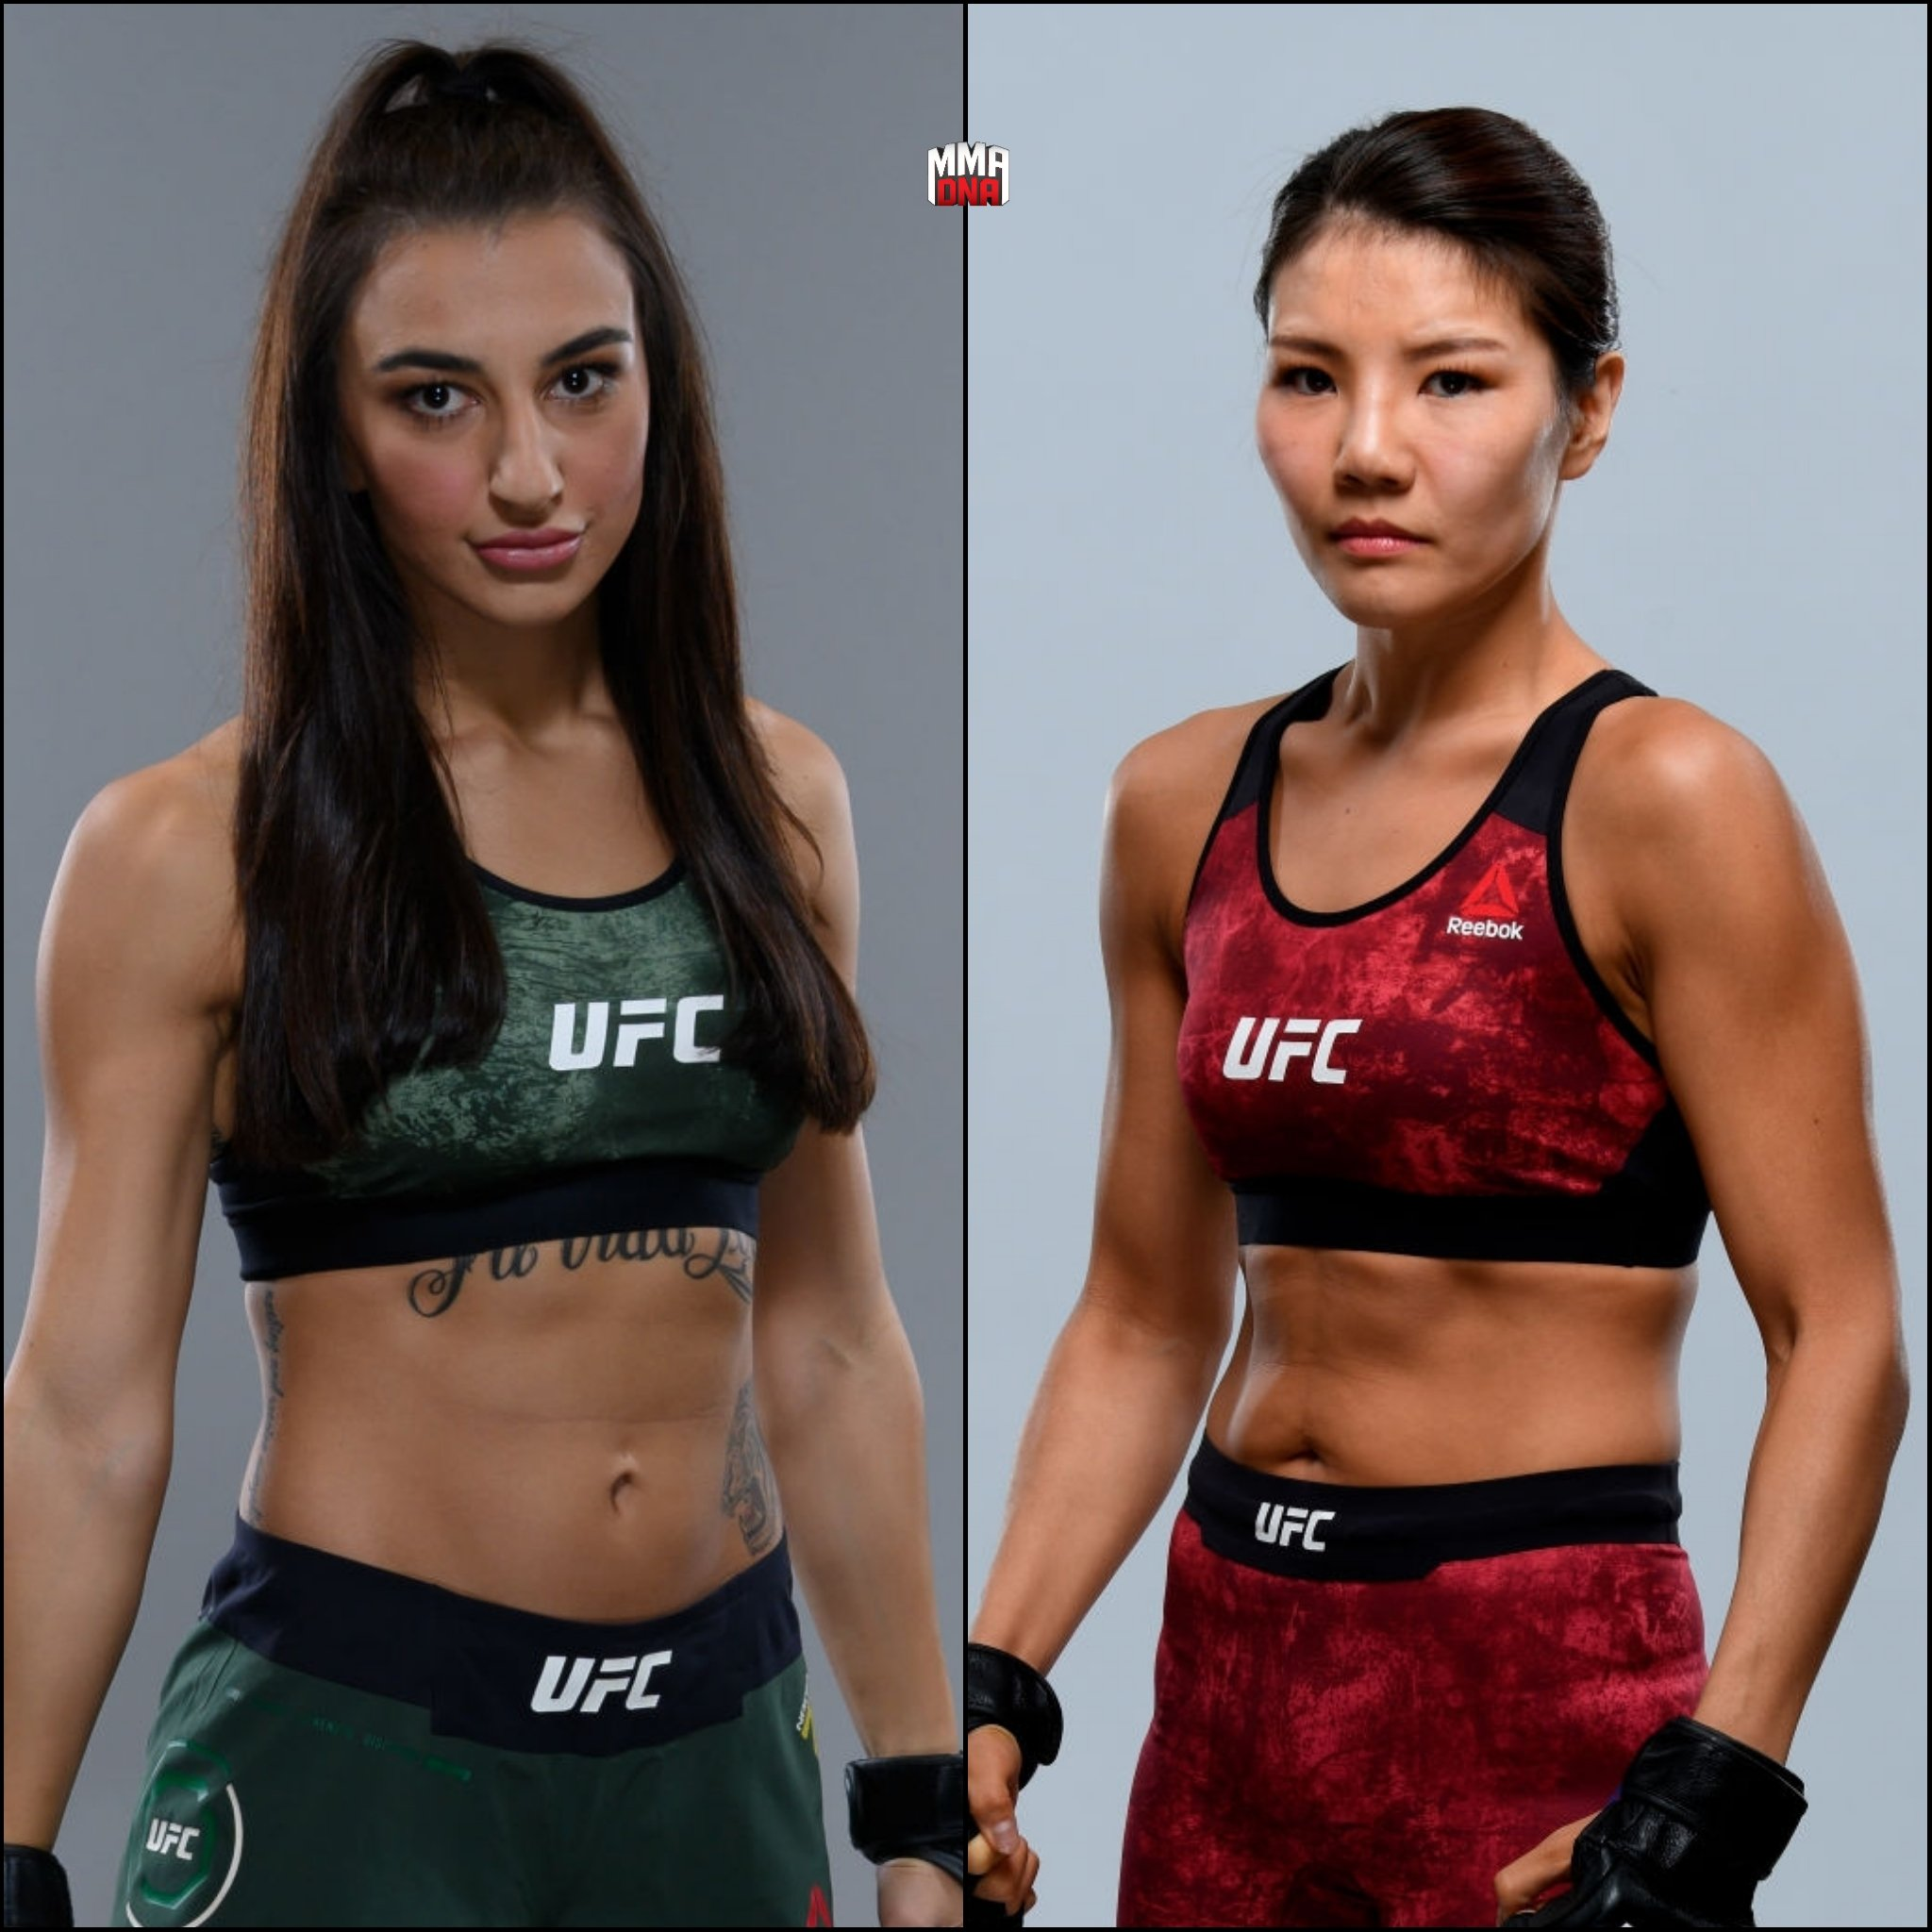 Nadia Kassem will fight Ji Yeon Kim at #UFC243 in Melbourne, Victoria, Australia. (Oct. 5, 2019). #UFC #MMA #UFCMelbourne #WMMA https://t.co/pGlG0IuYmC